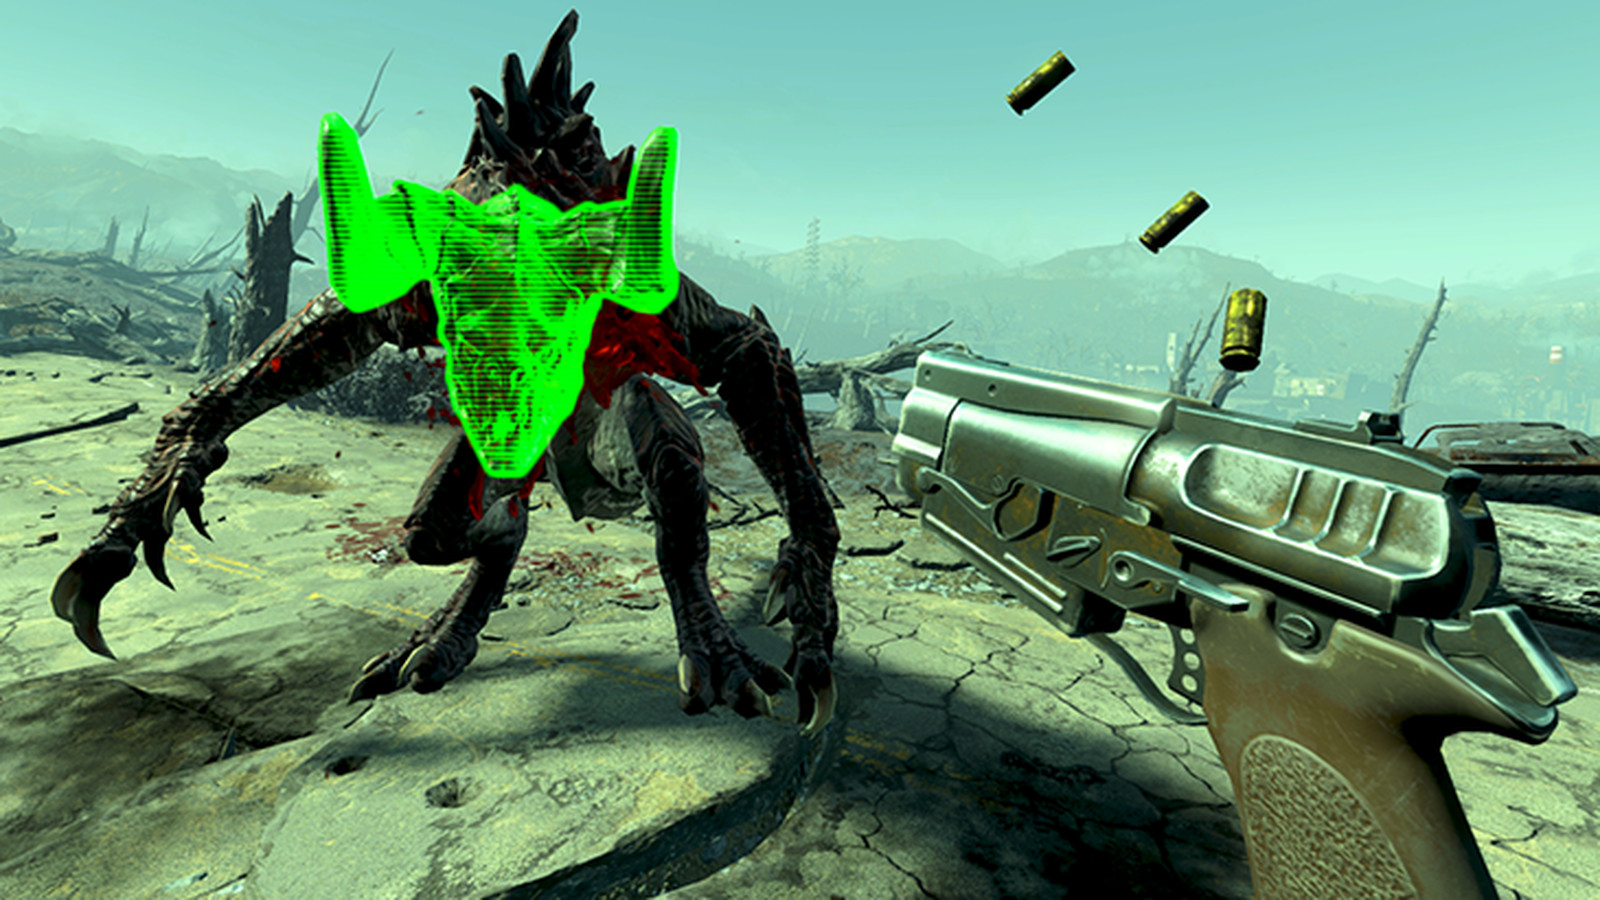 Bethesda announces release dates for Fallout, Doom, and Skyrim VR